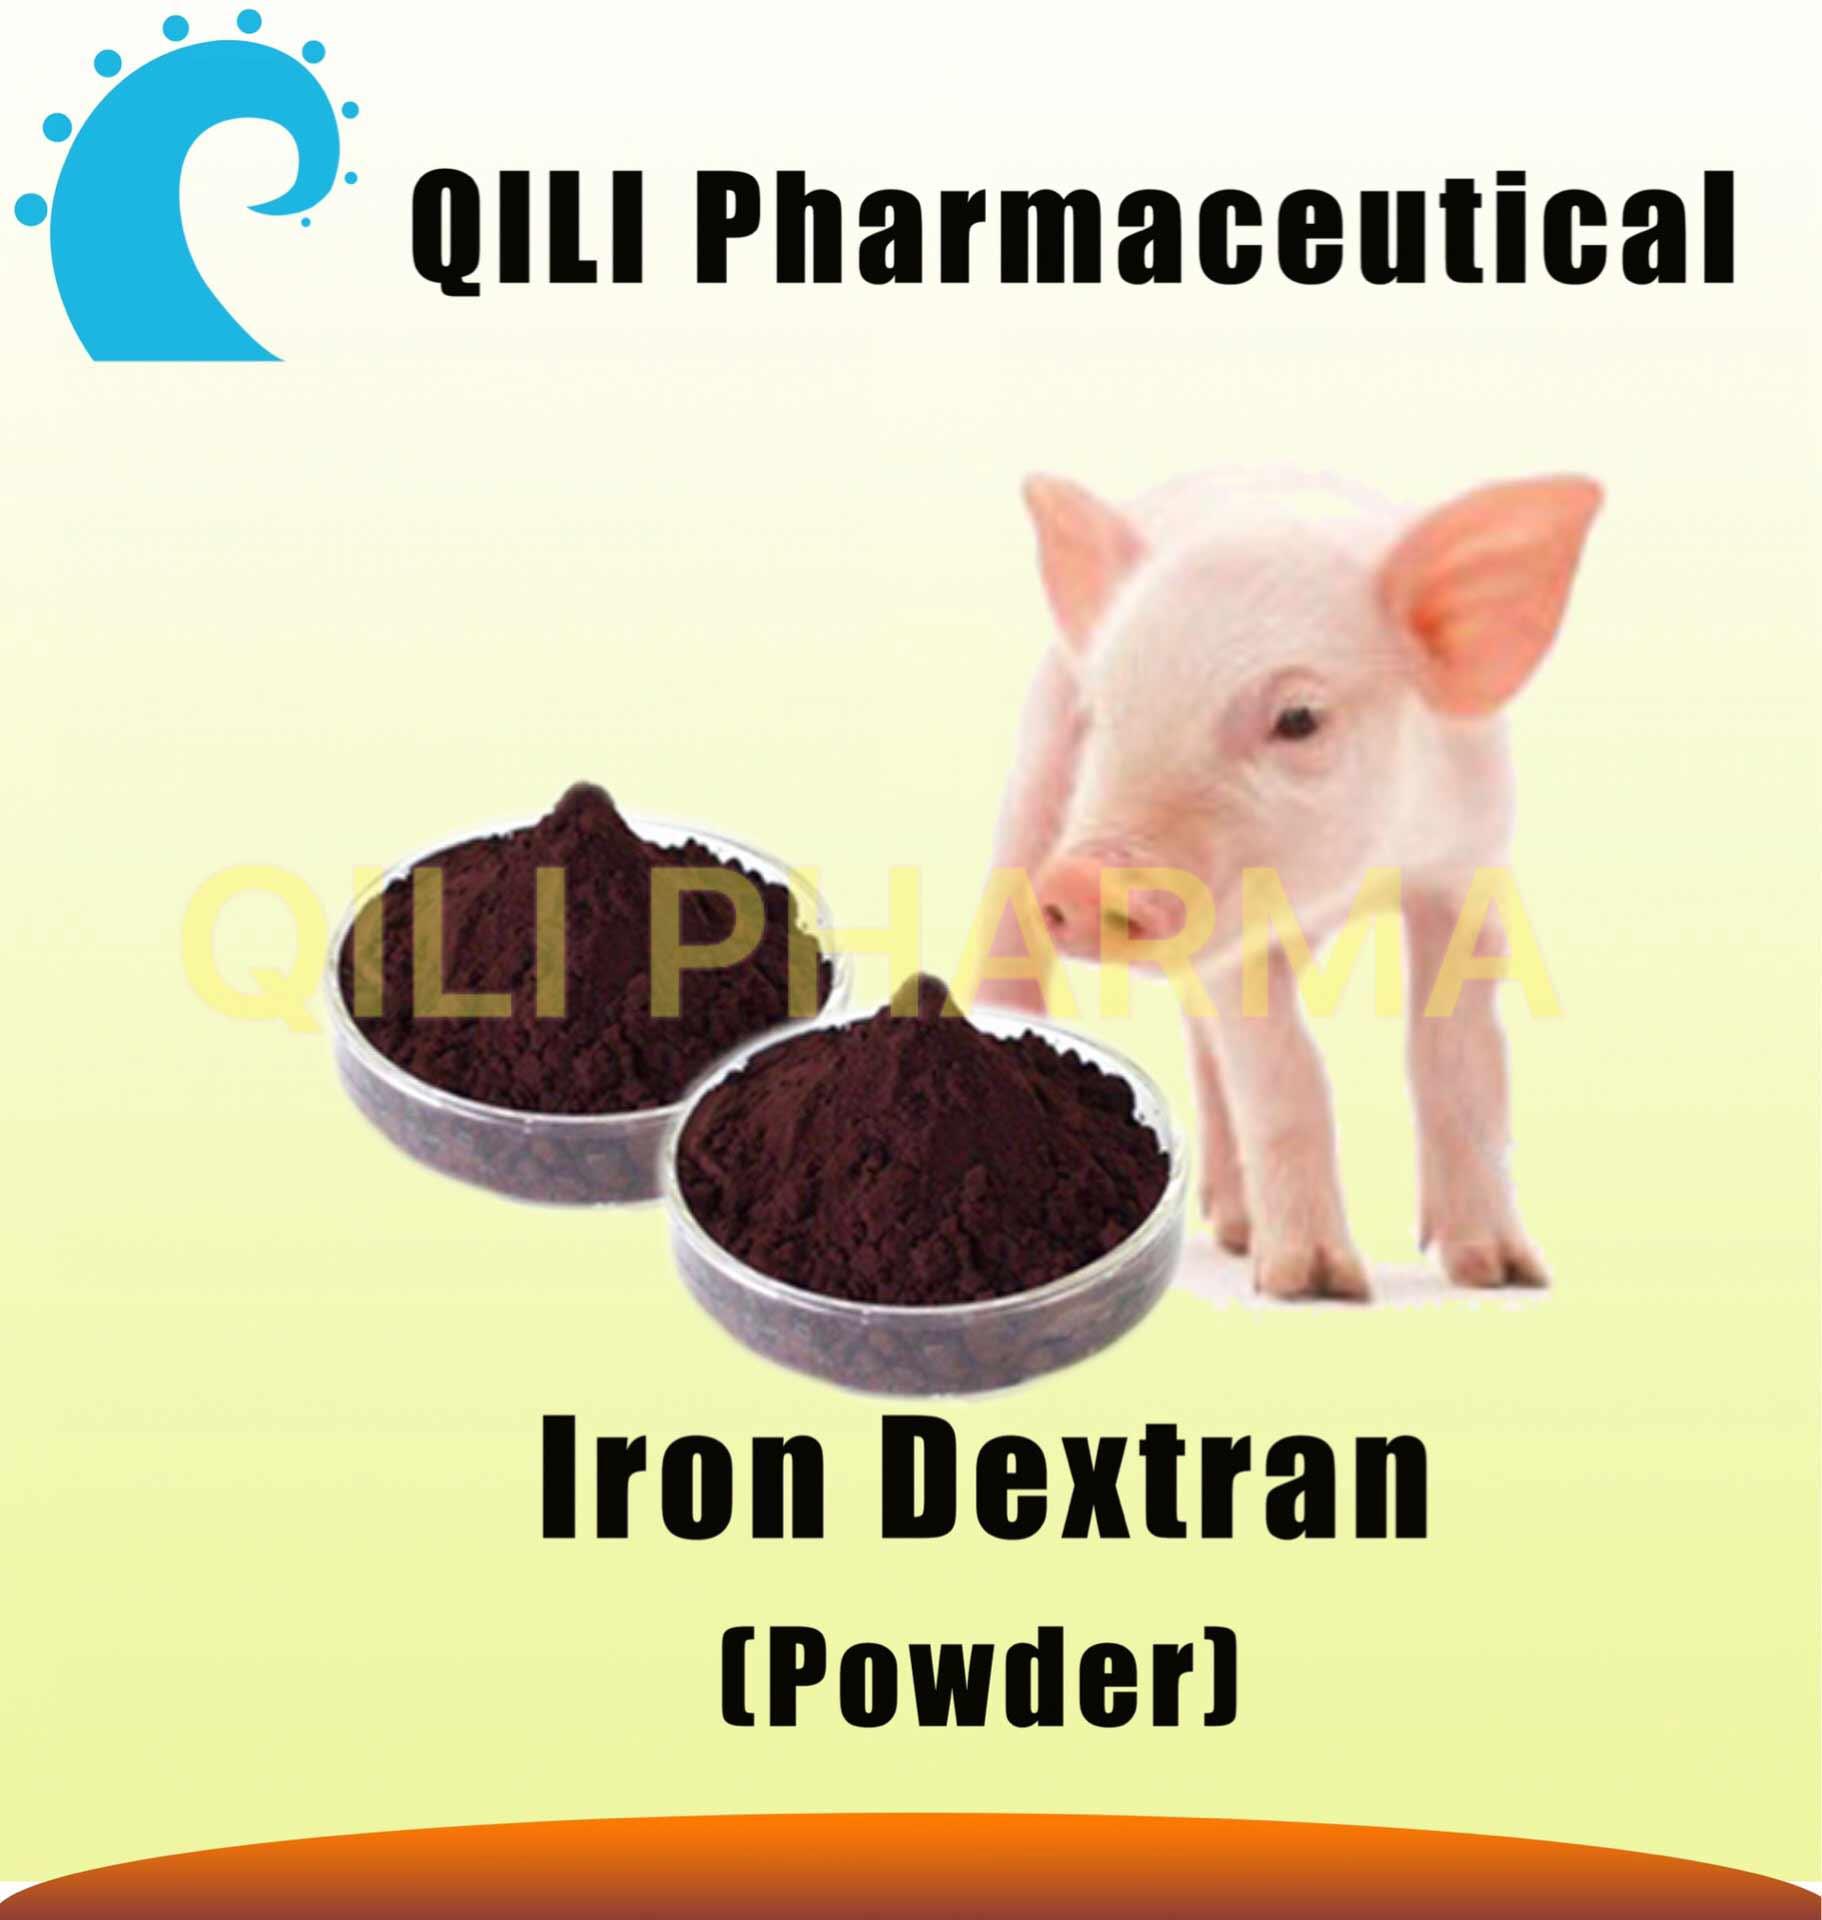 IRON DEXTRAN 25% Powder